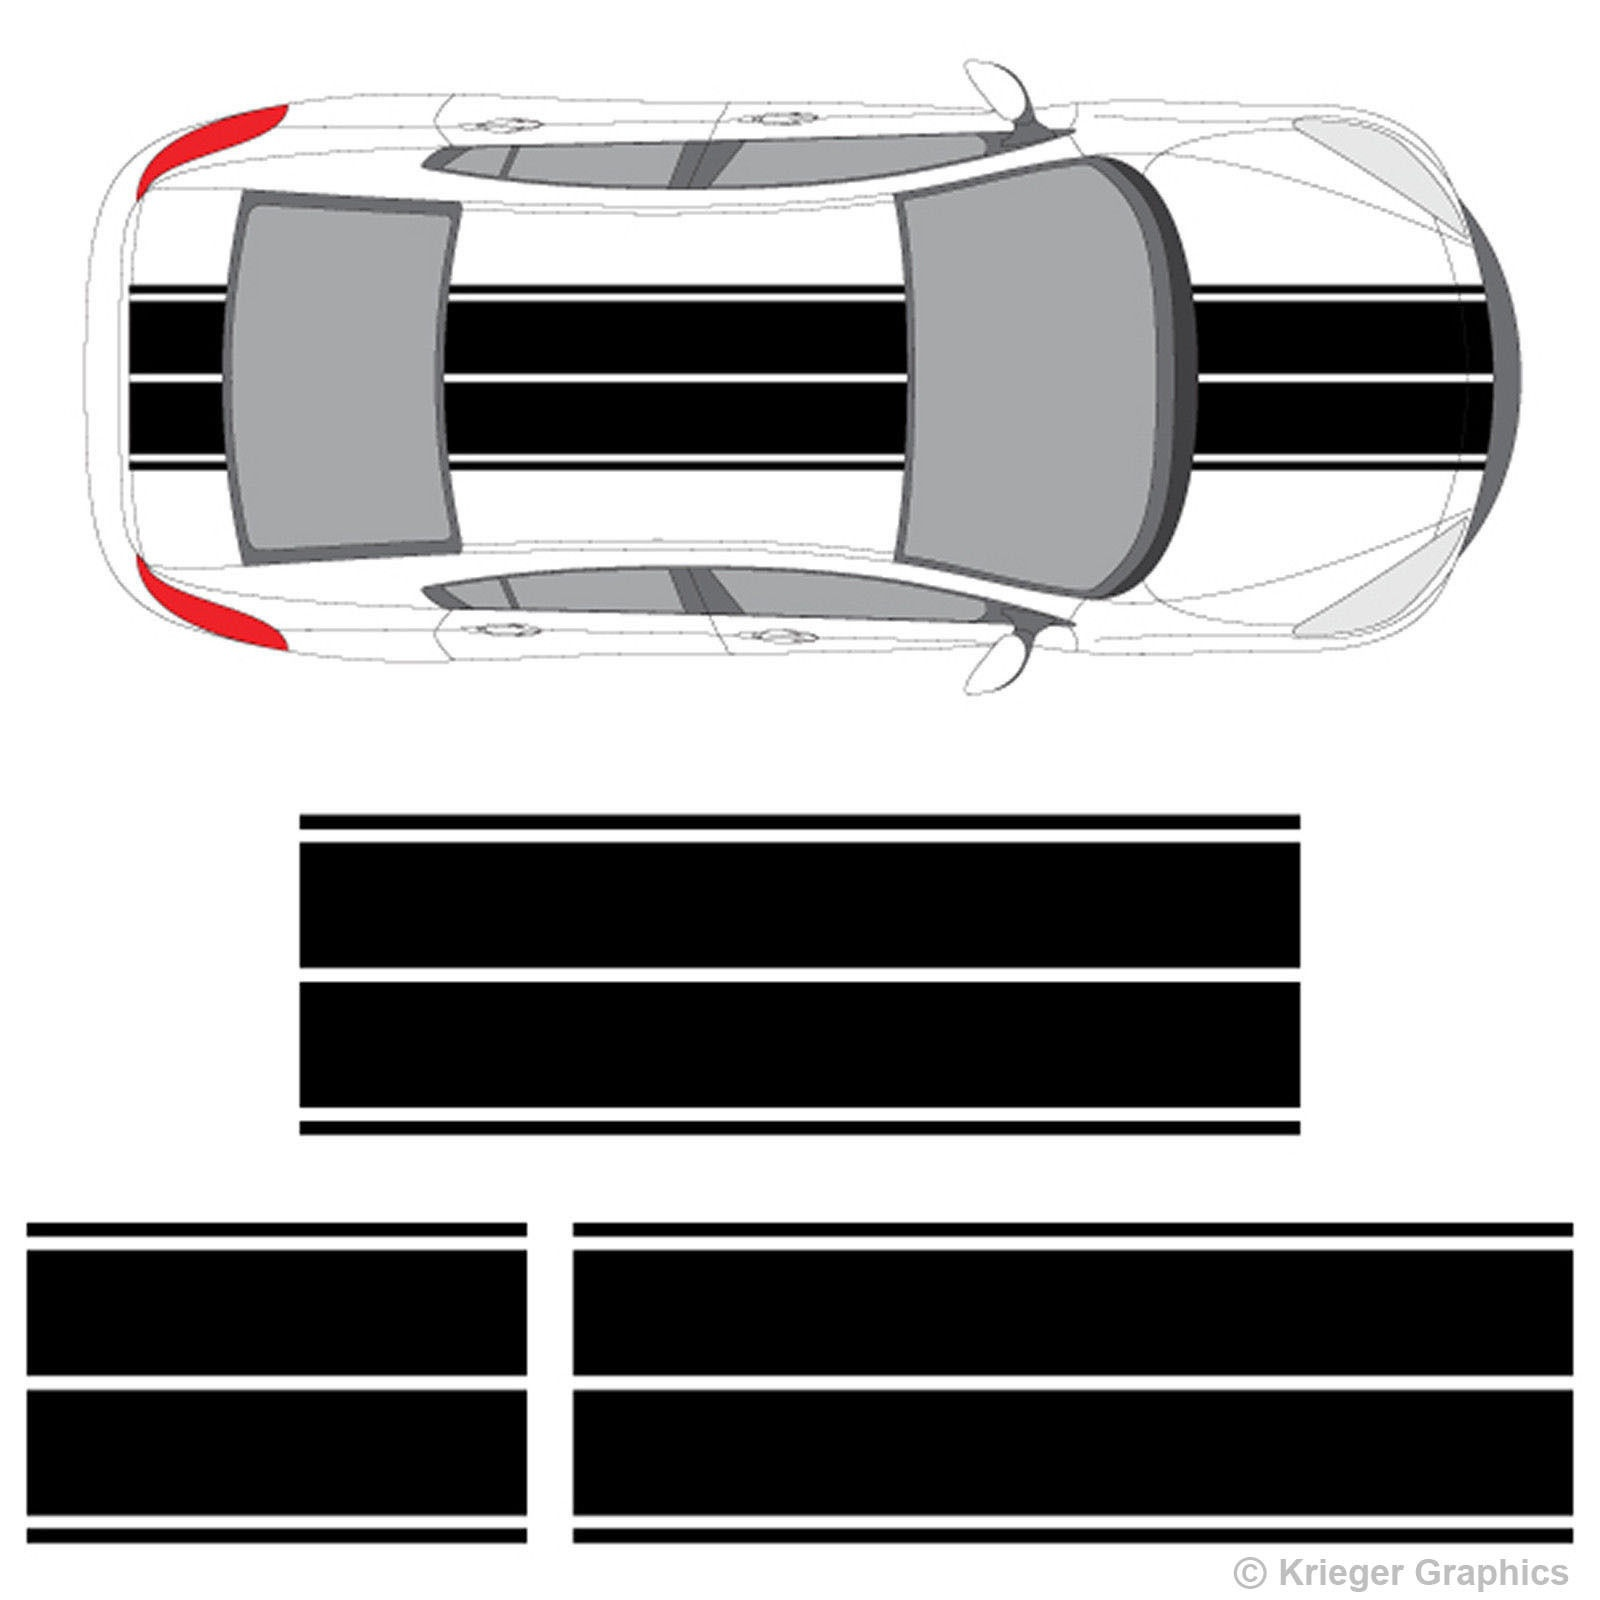 MAZDA RACING 2 3 5 7 RX7 RX8 Miata Mazdaspeed Decal sticker emblem logo Pair W